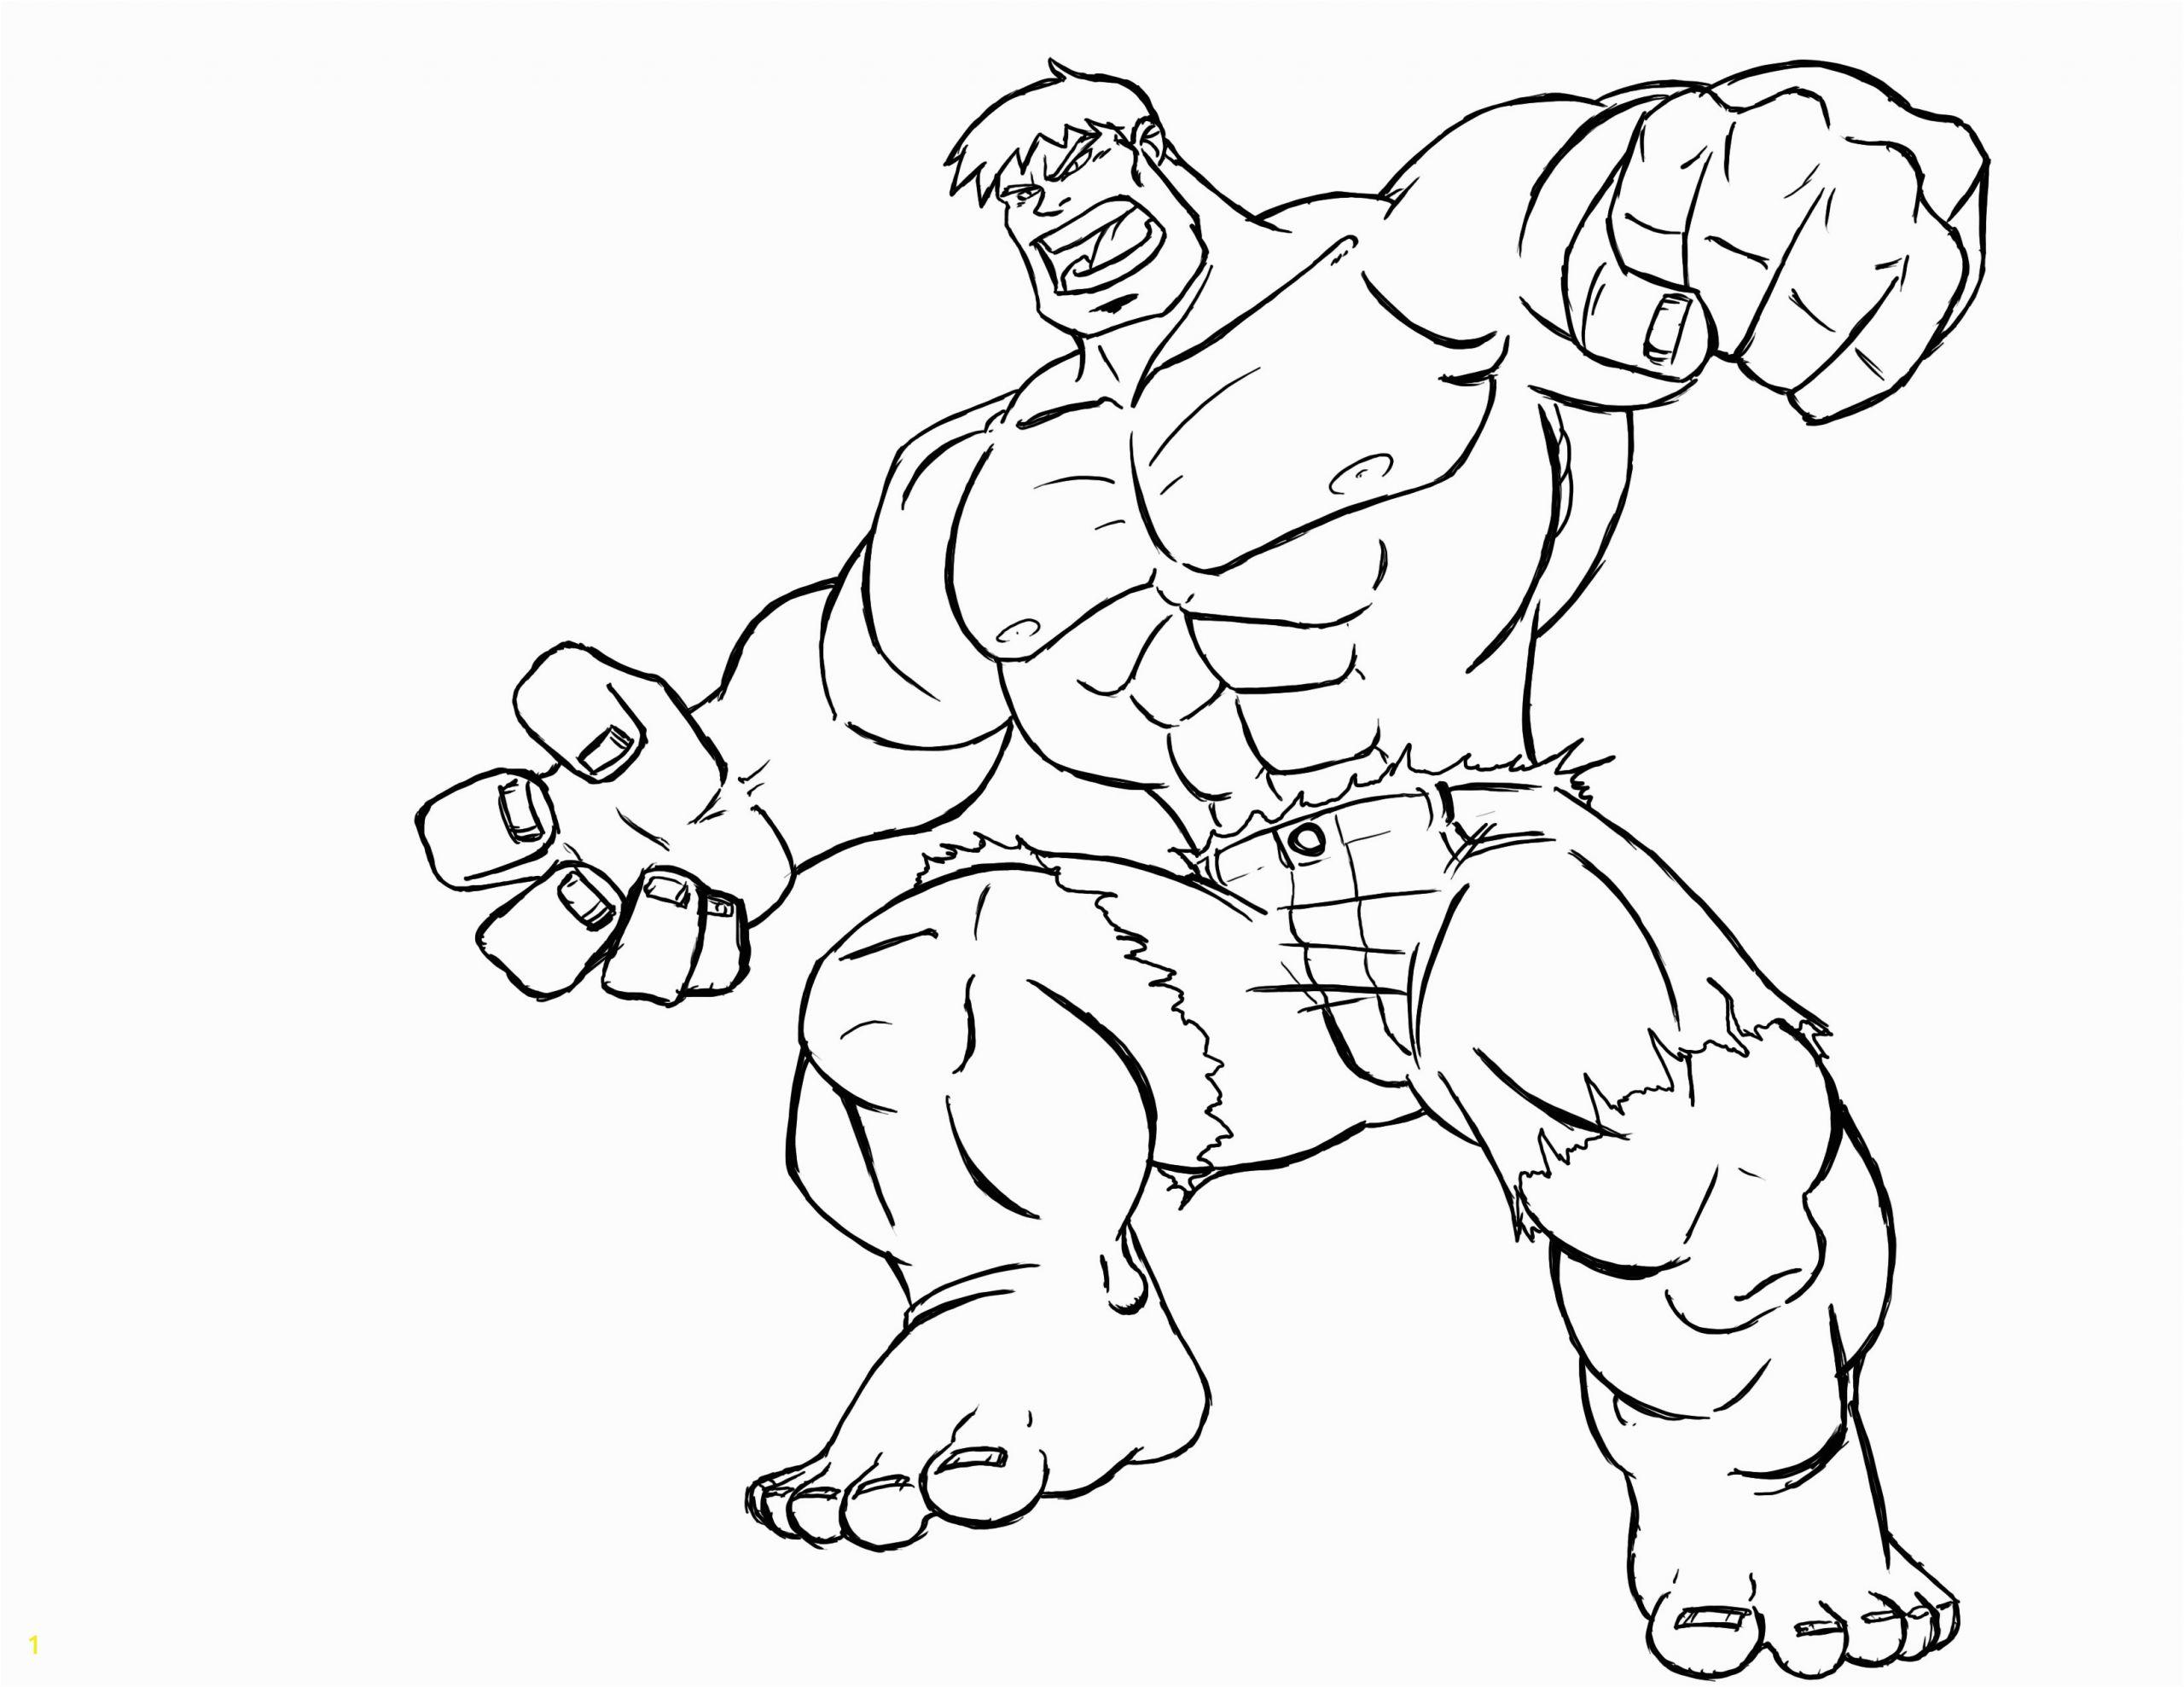 Free Hulk Coloring Pages Dc Superheroes Colouring Sheets Dc Burlingtonjs org